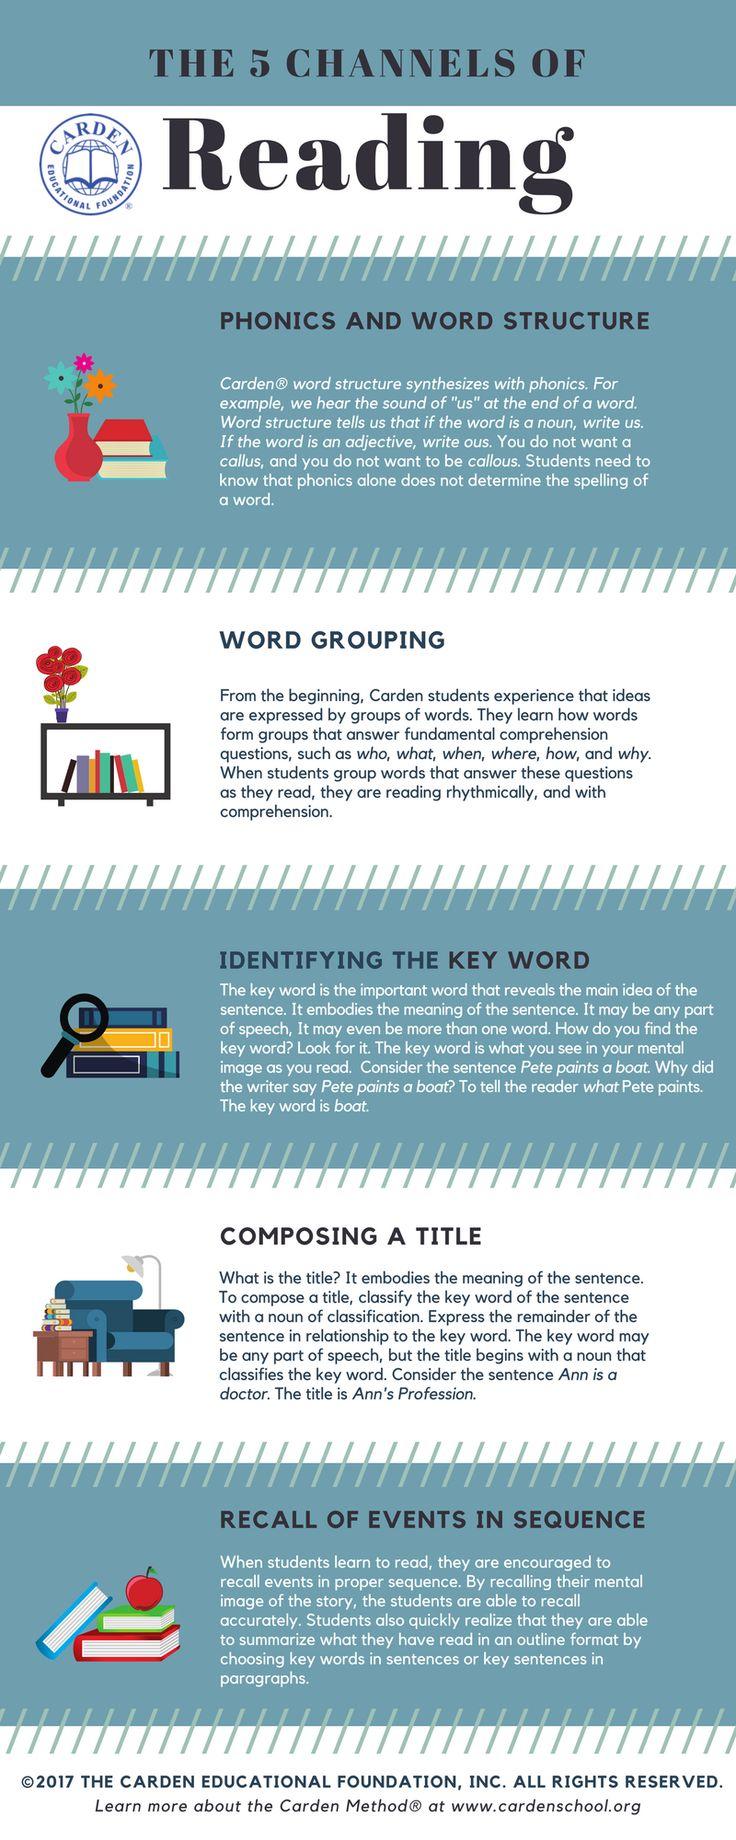 5 ways to increase reading comprehension.